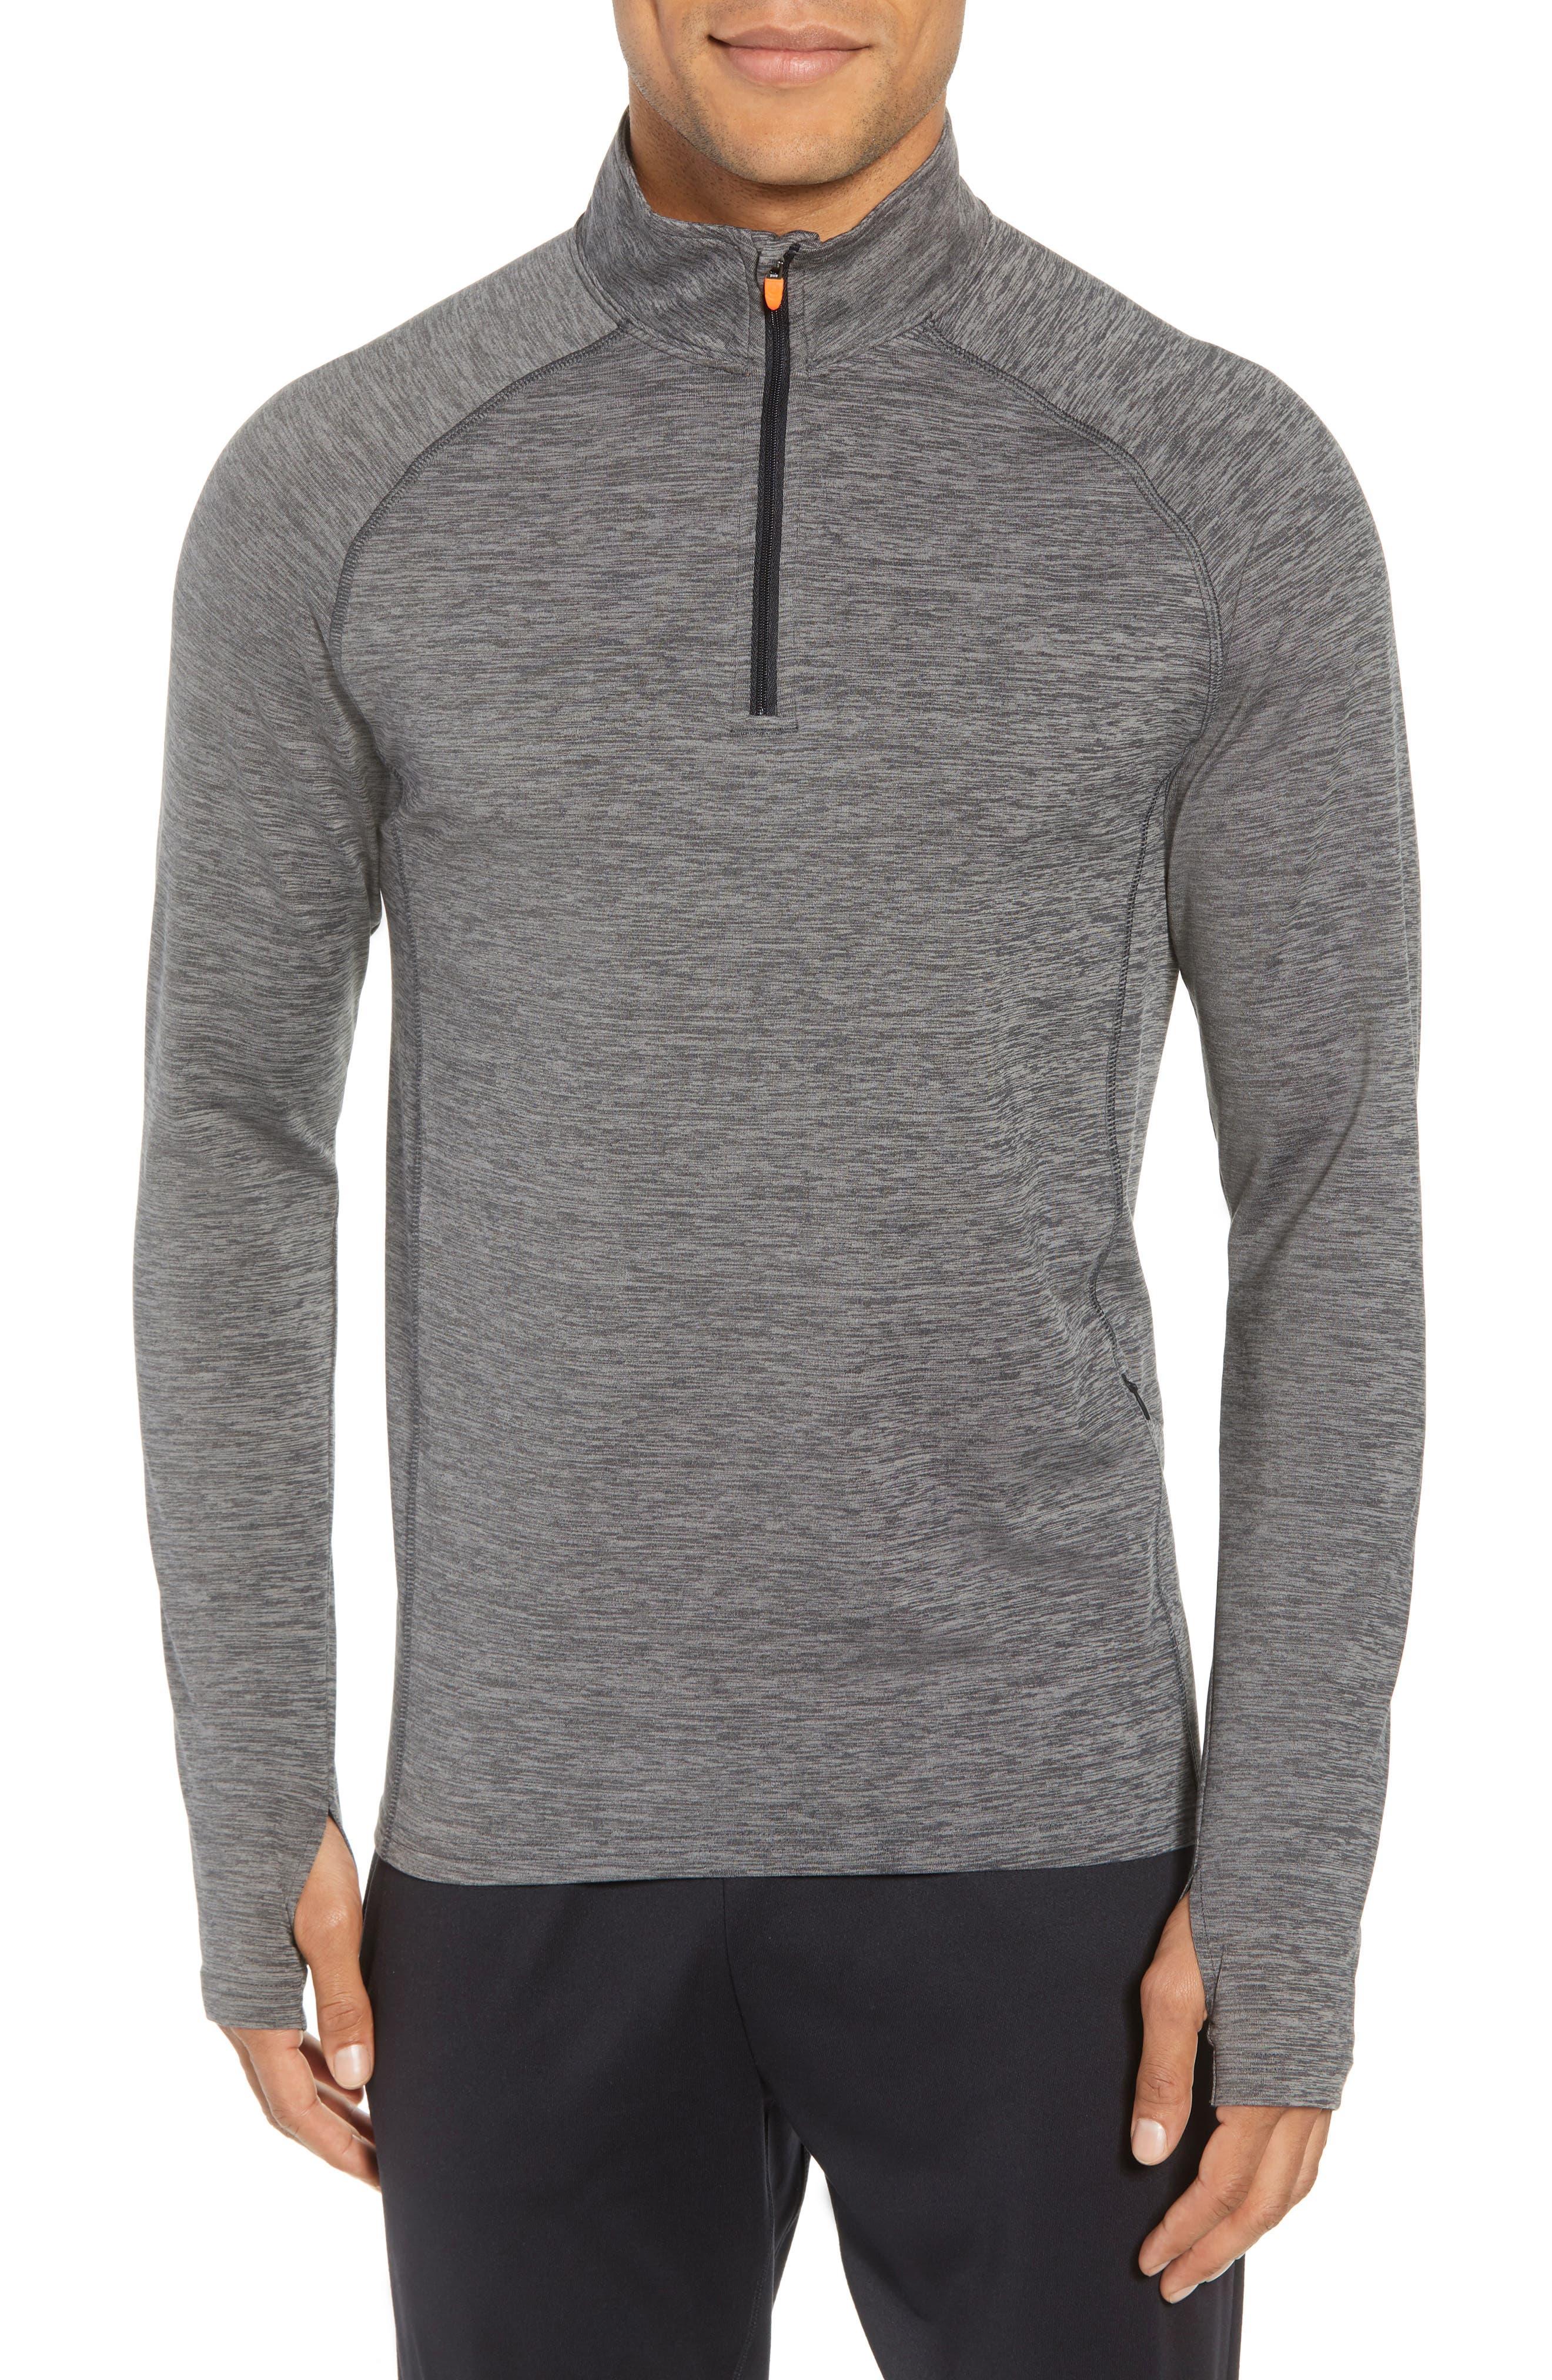 Core Half Zip Sweatshirt,                         Main,                         color, Black Pepper Spacedye